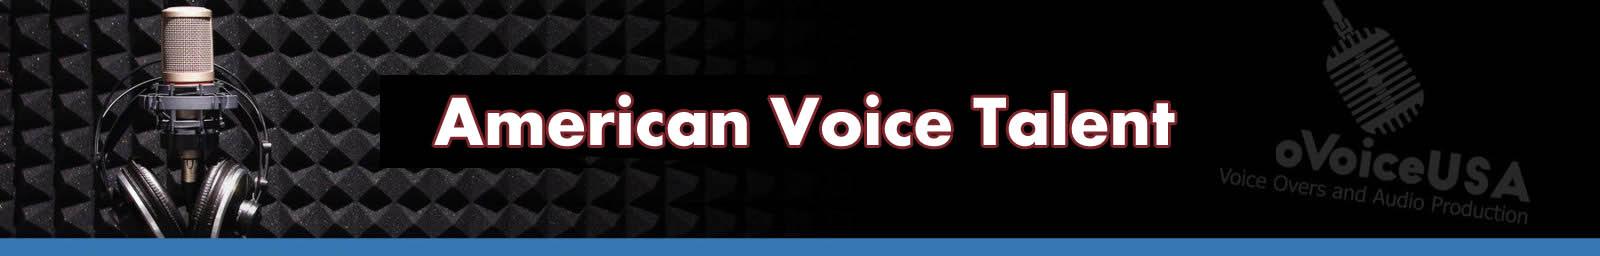 American Voice Talent | American Voice Recording Service | ProVoice USA